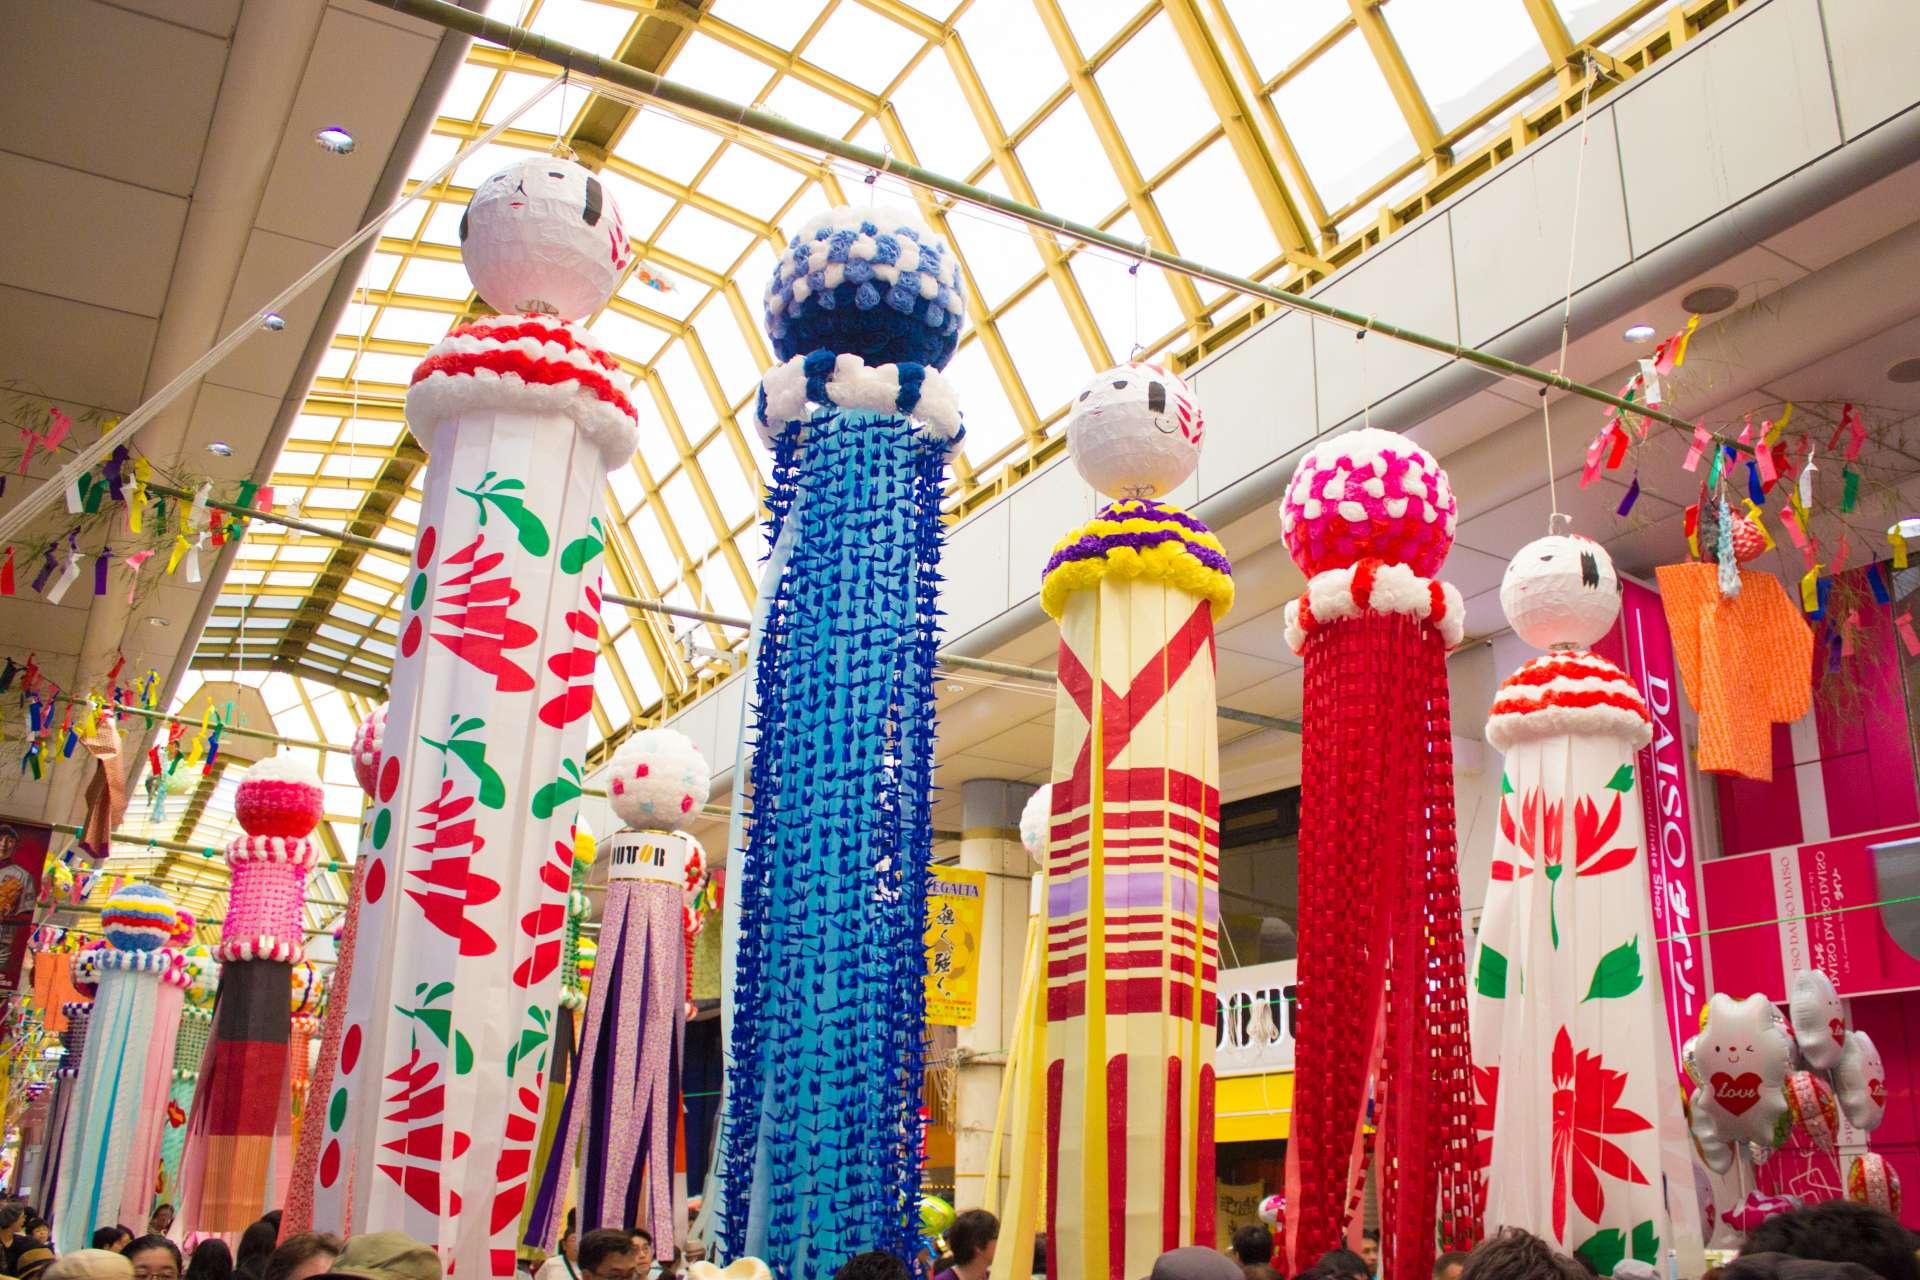 Tanabata decorations on the Sendai Tanabata Festival